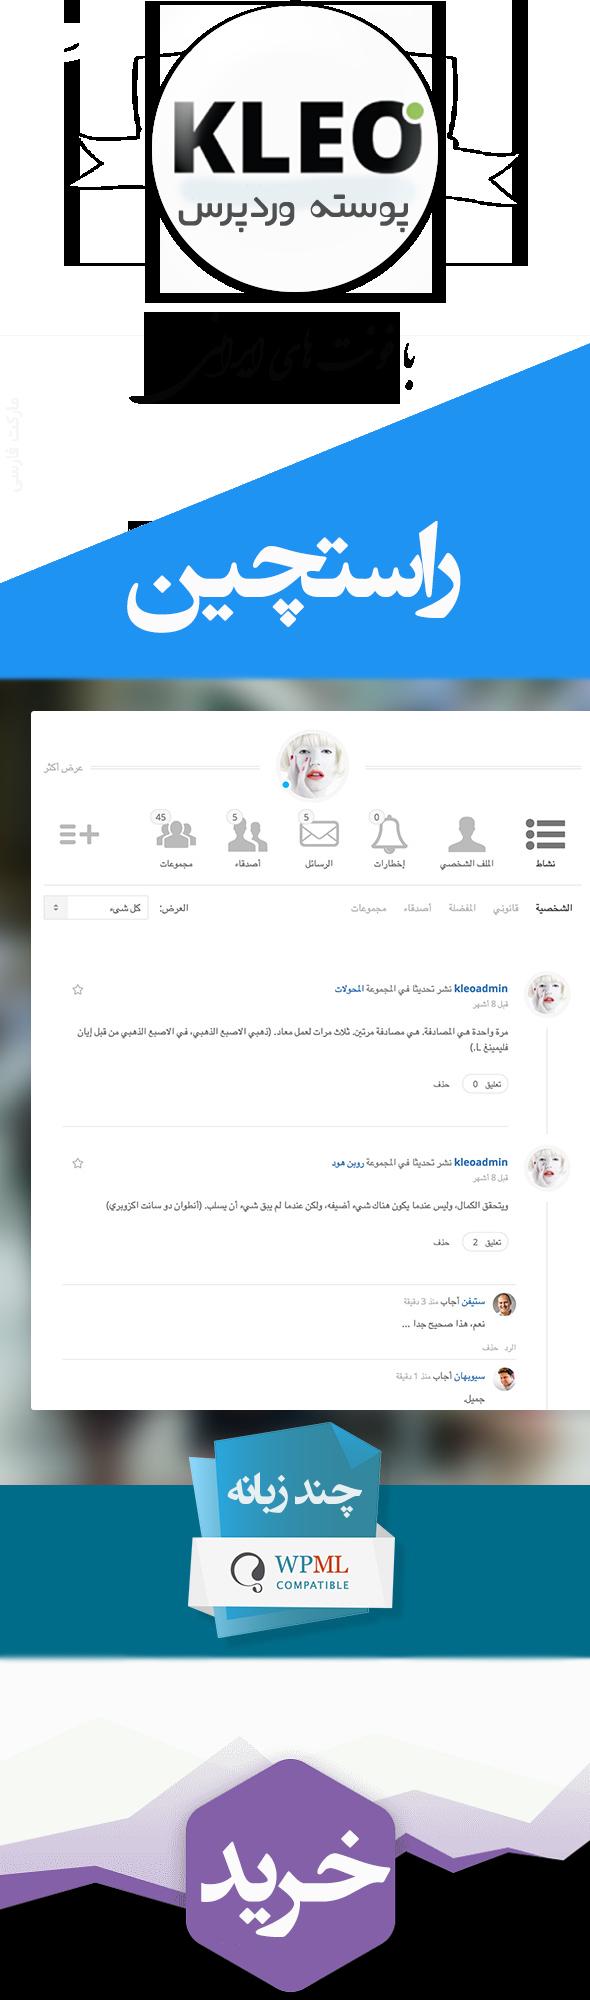 kelo-screenshot